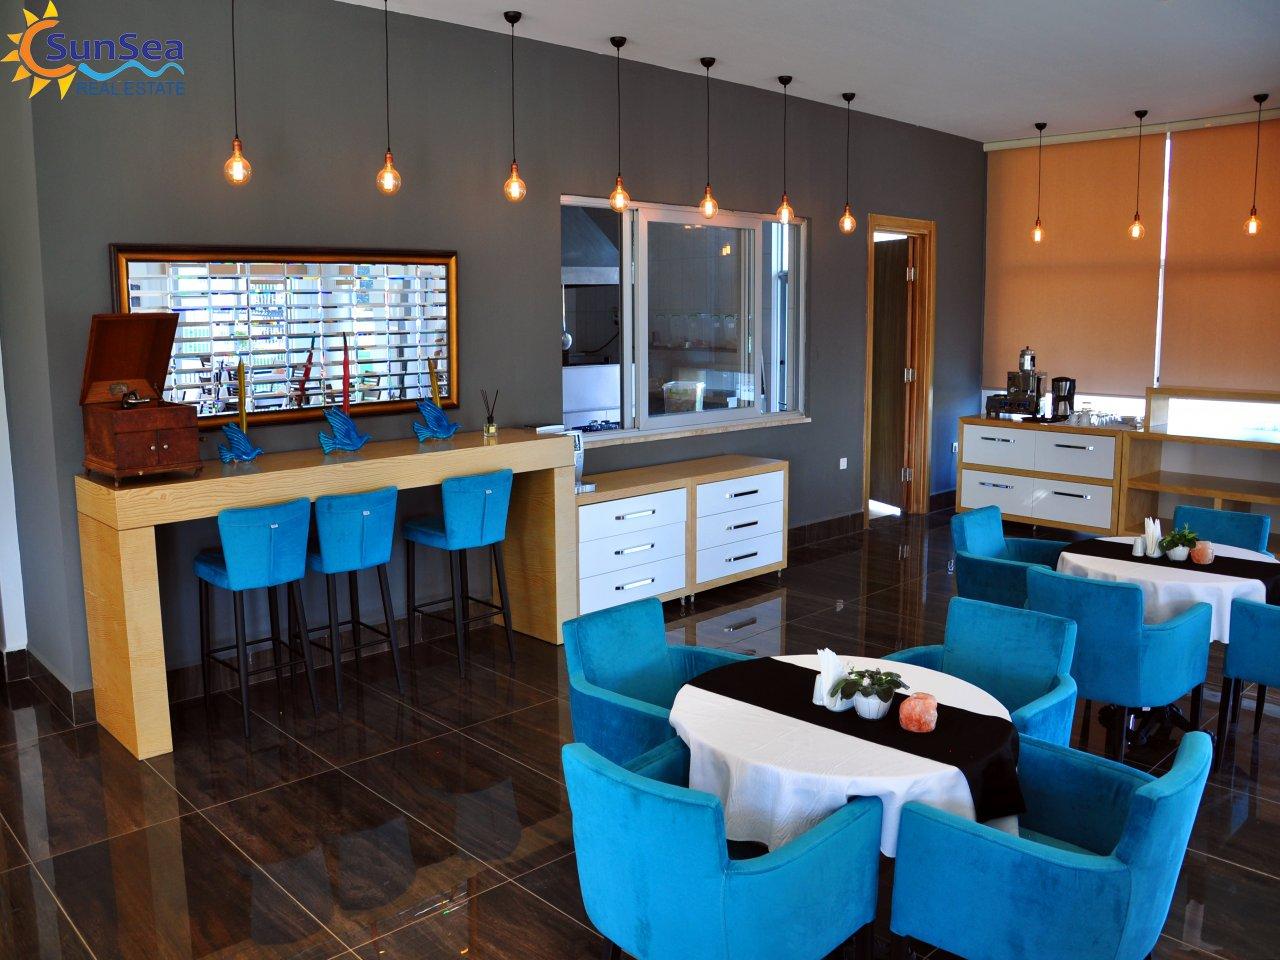 Alanya fortuna resort restaurant